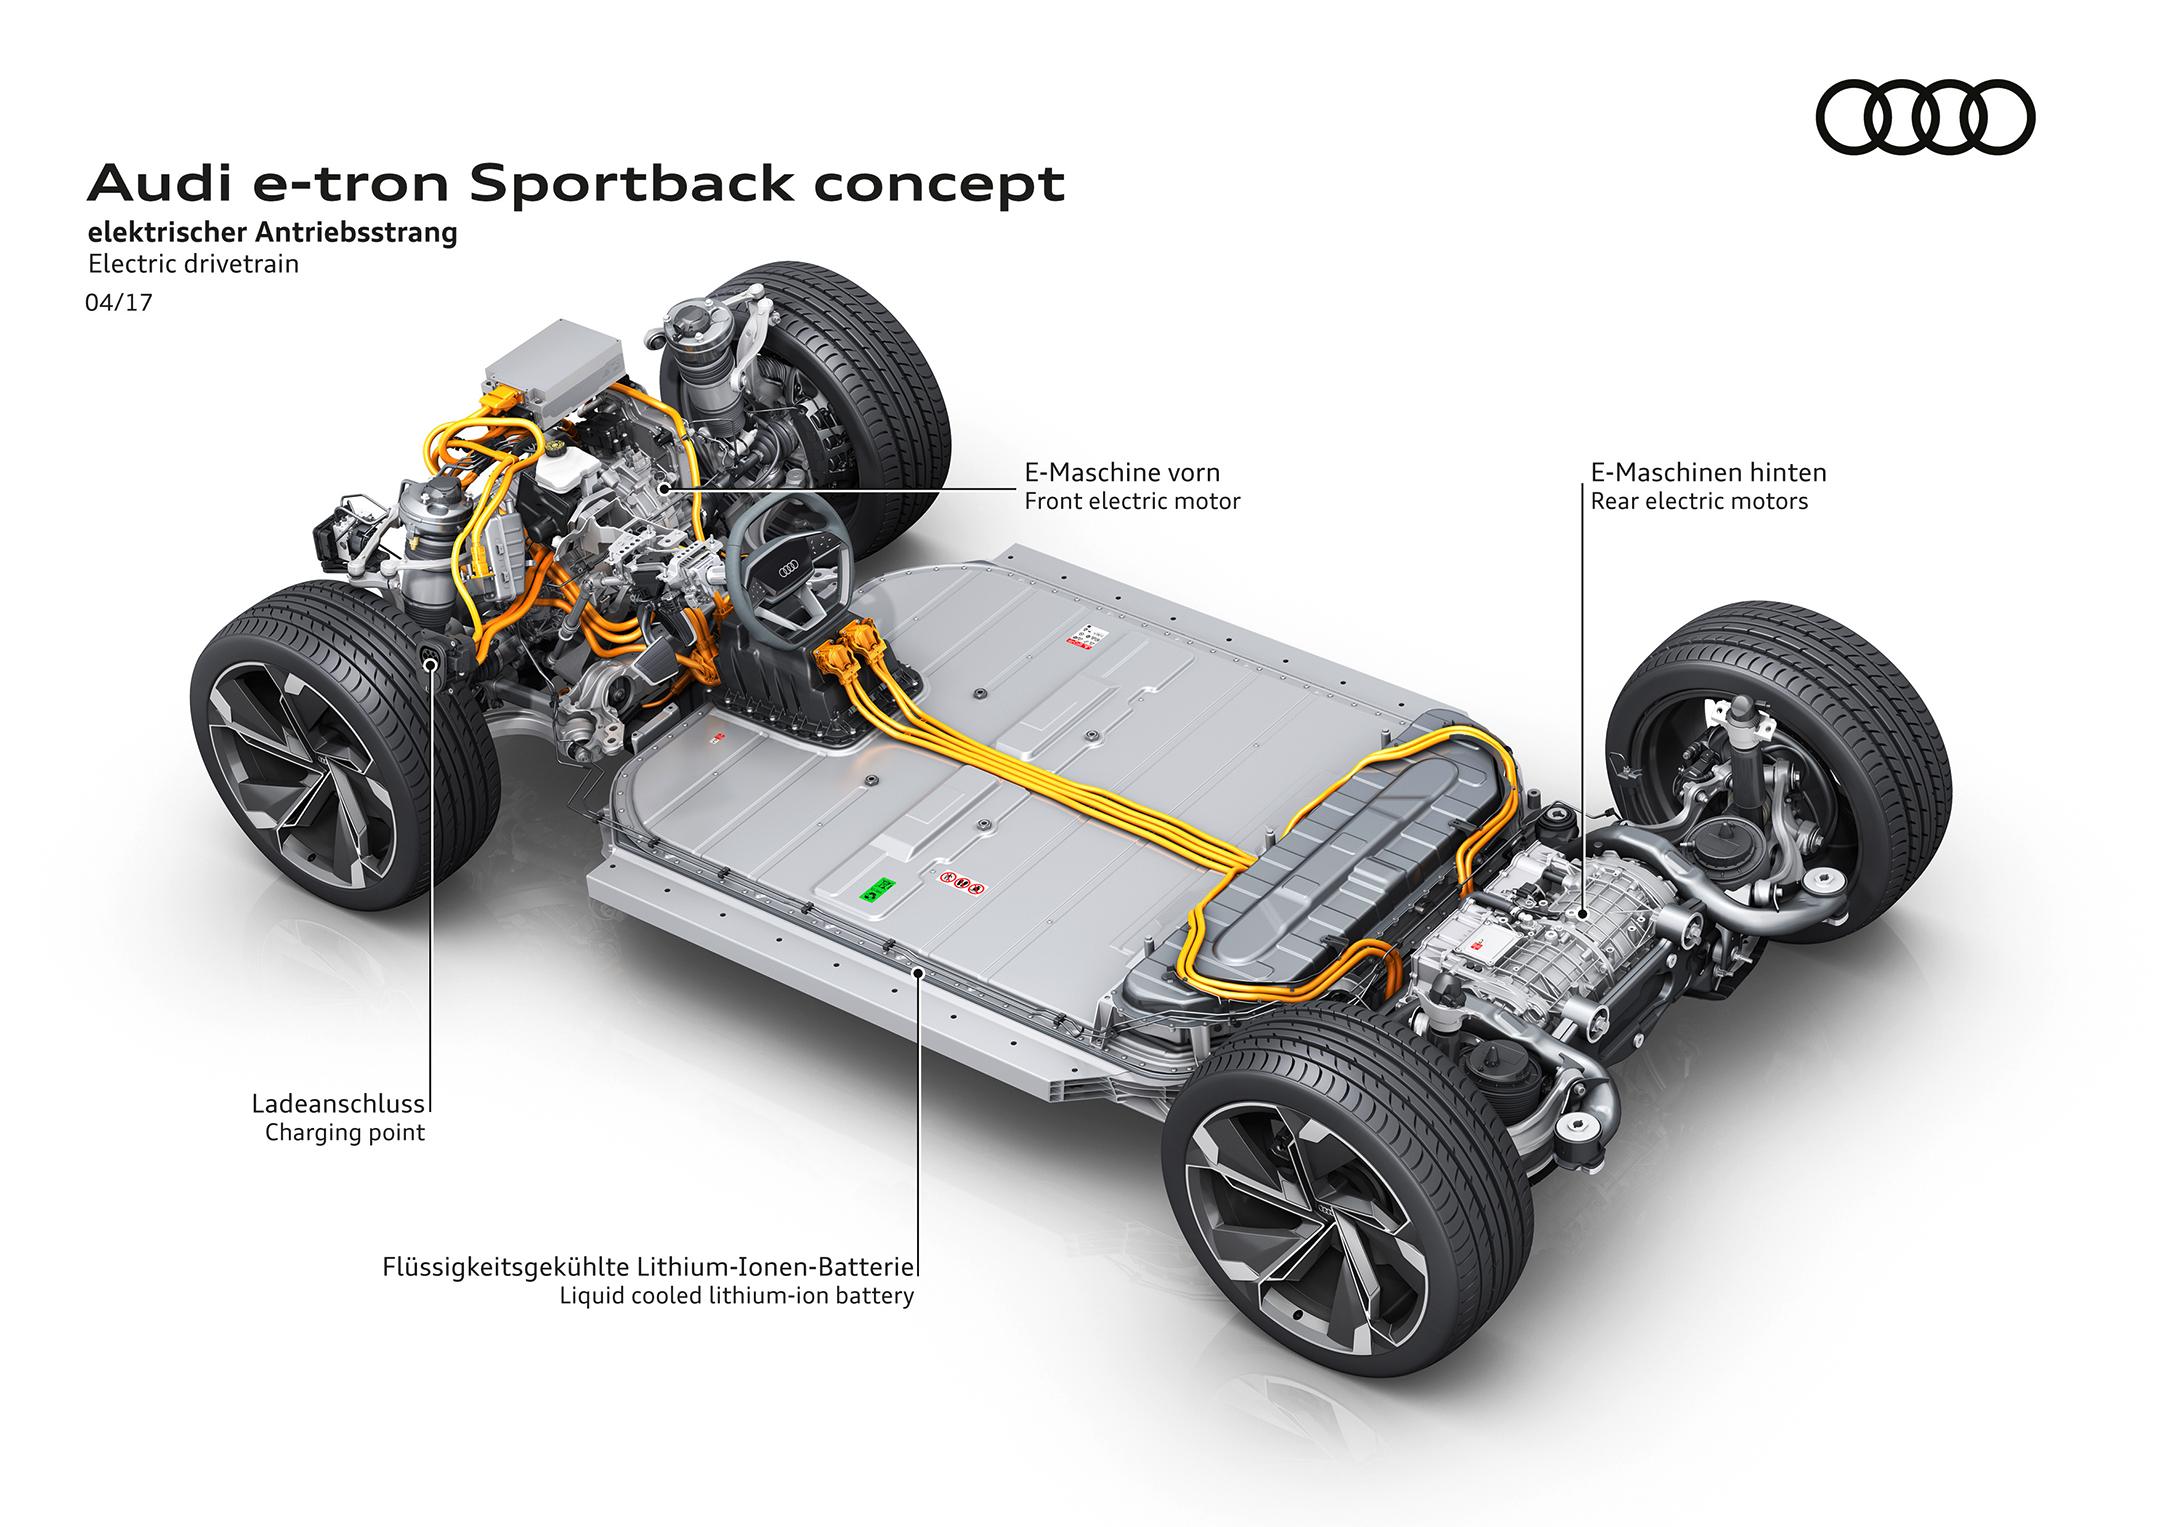 Audi e-tron Sportback concept - 2017 - electric drivetrain